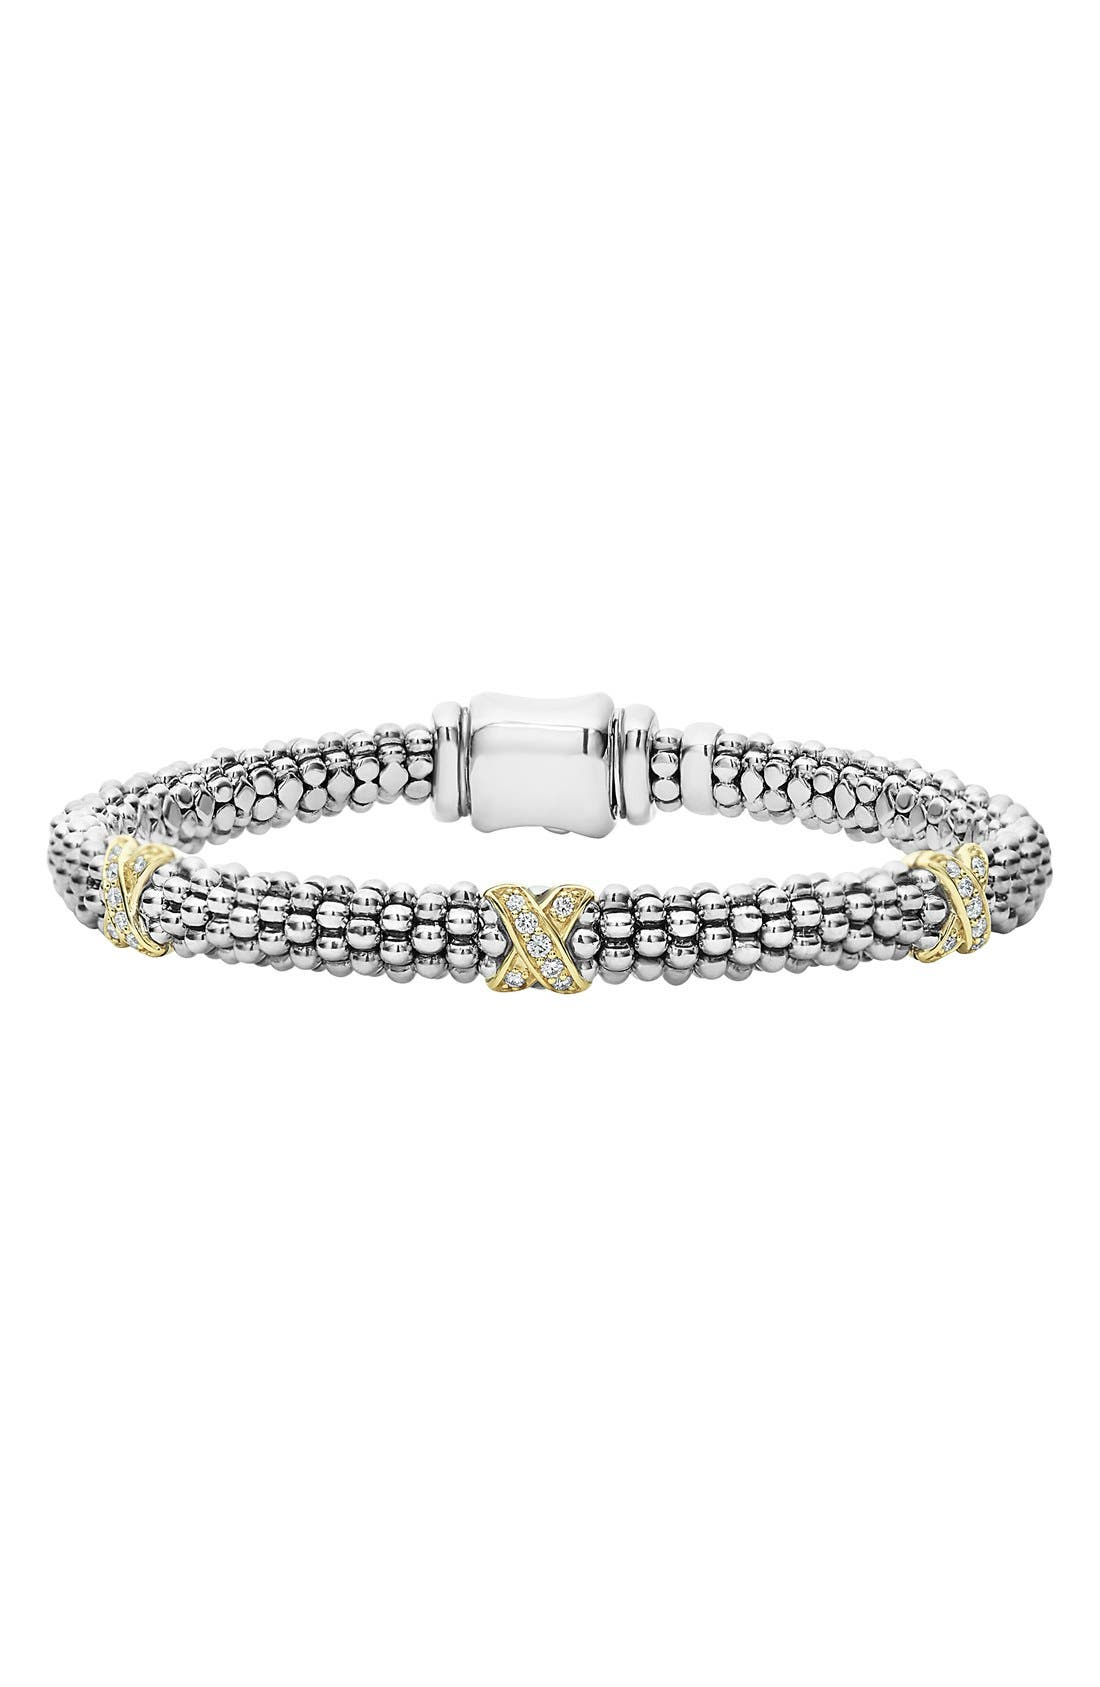 Alternate Image 1 Selected - LAGOS 'Signature Caviar' Diamond Rope Bracelet